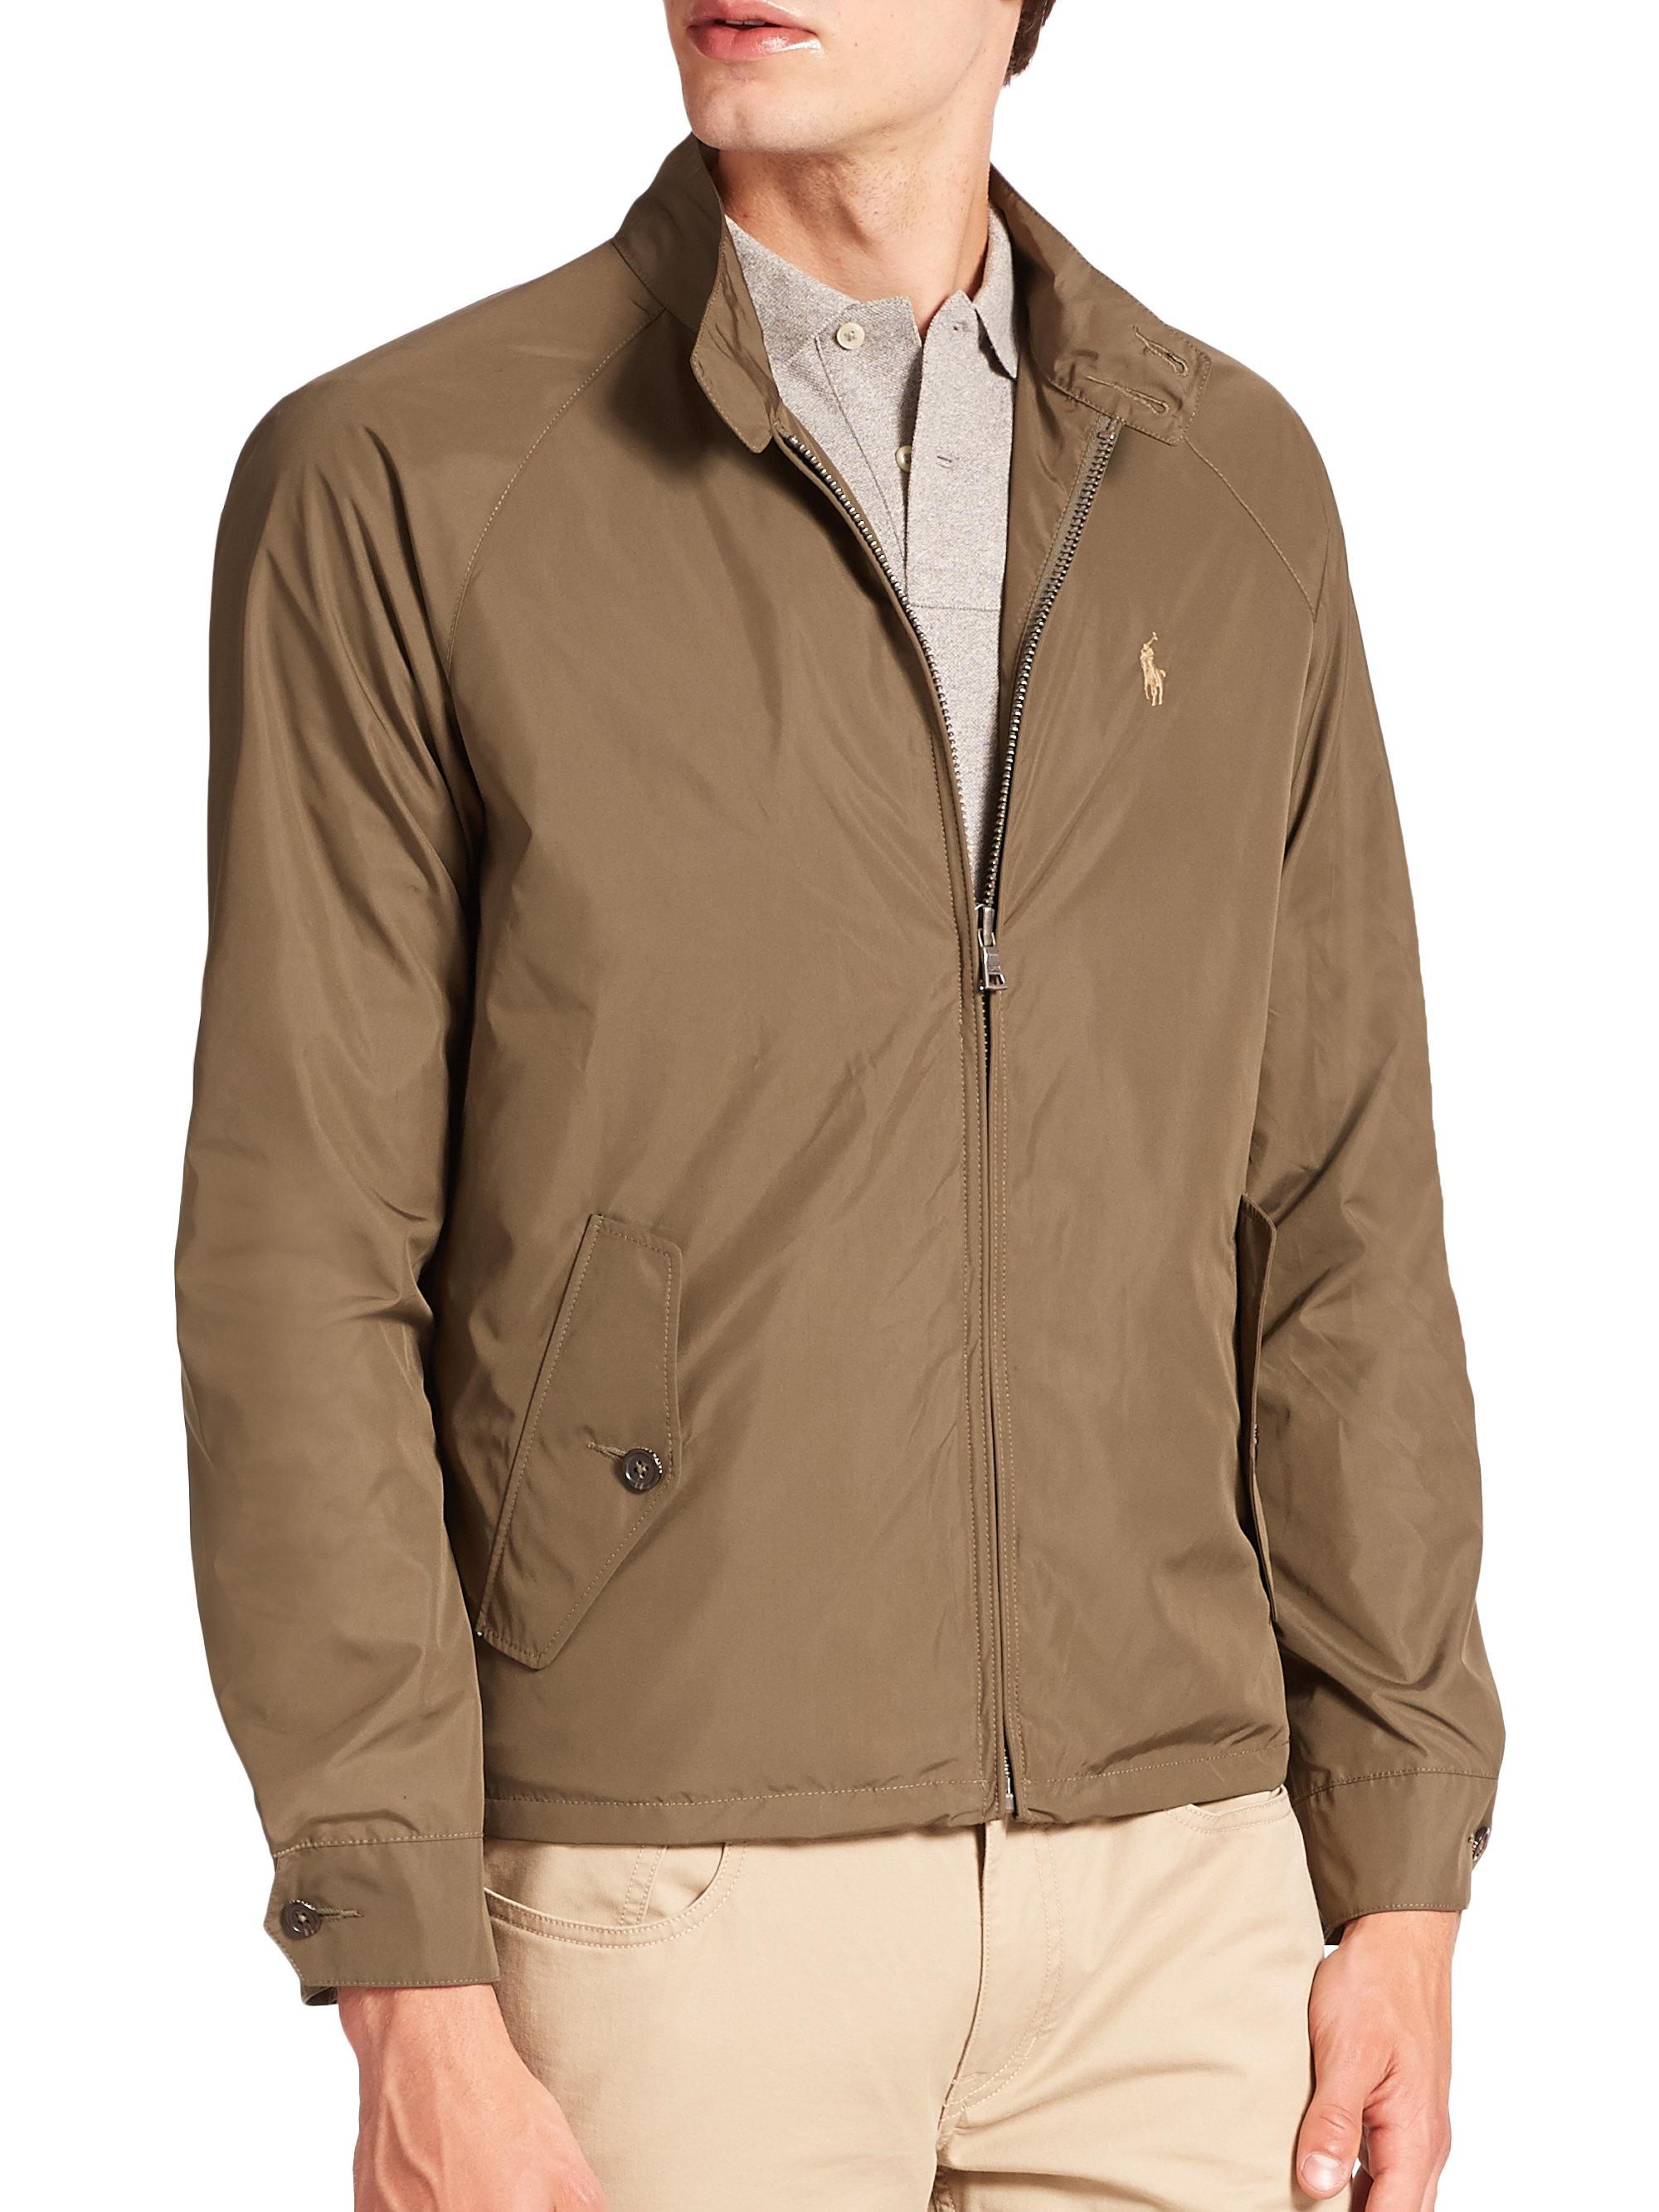 5d4ea0bfdfa0c6 Lyst - Polo Ralph Lauren Packable Barracuda Jacket in Green for Men